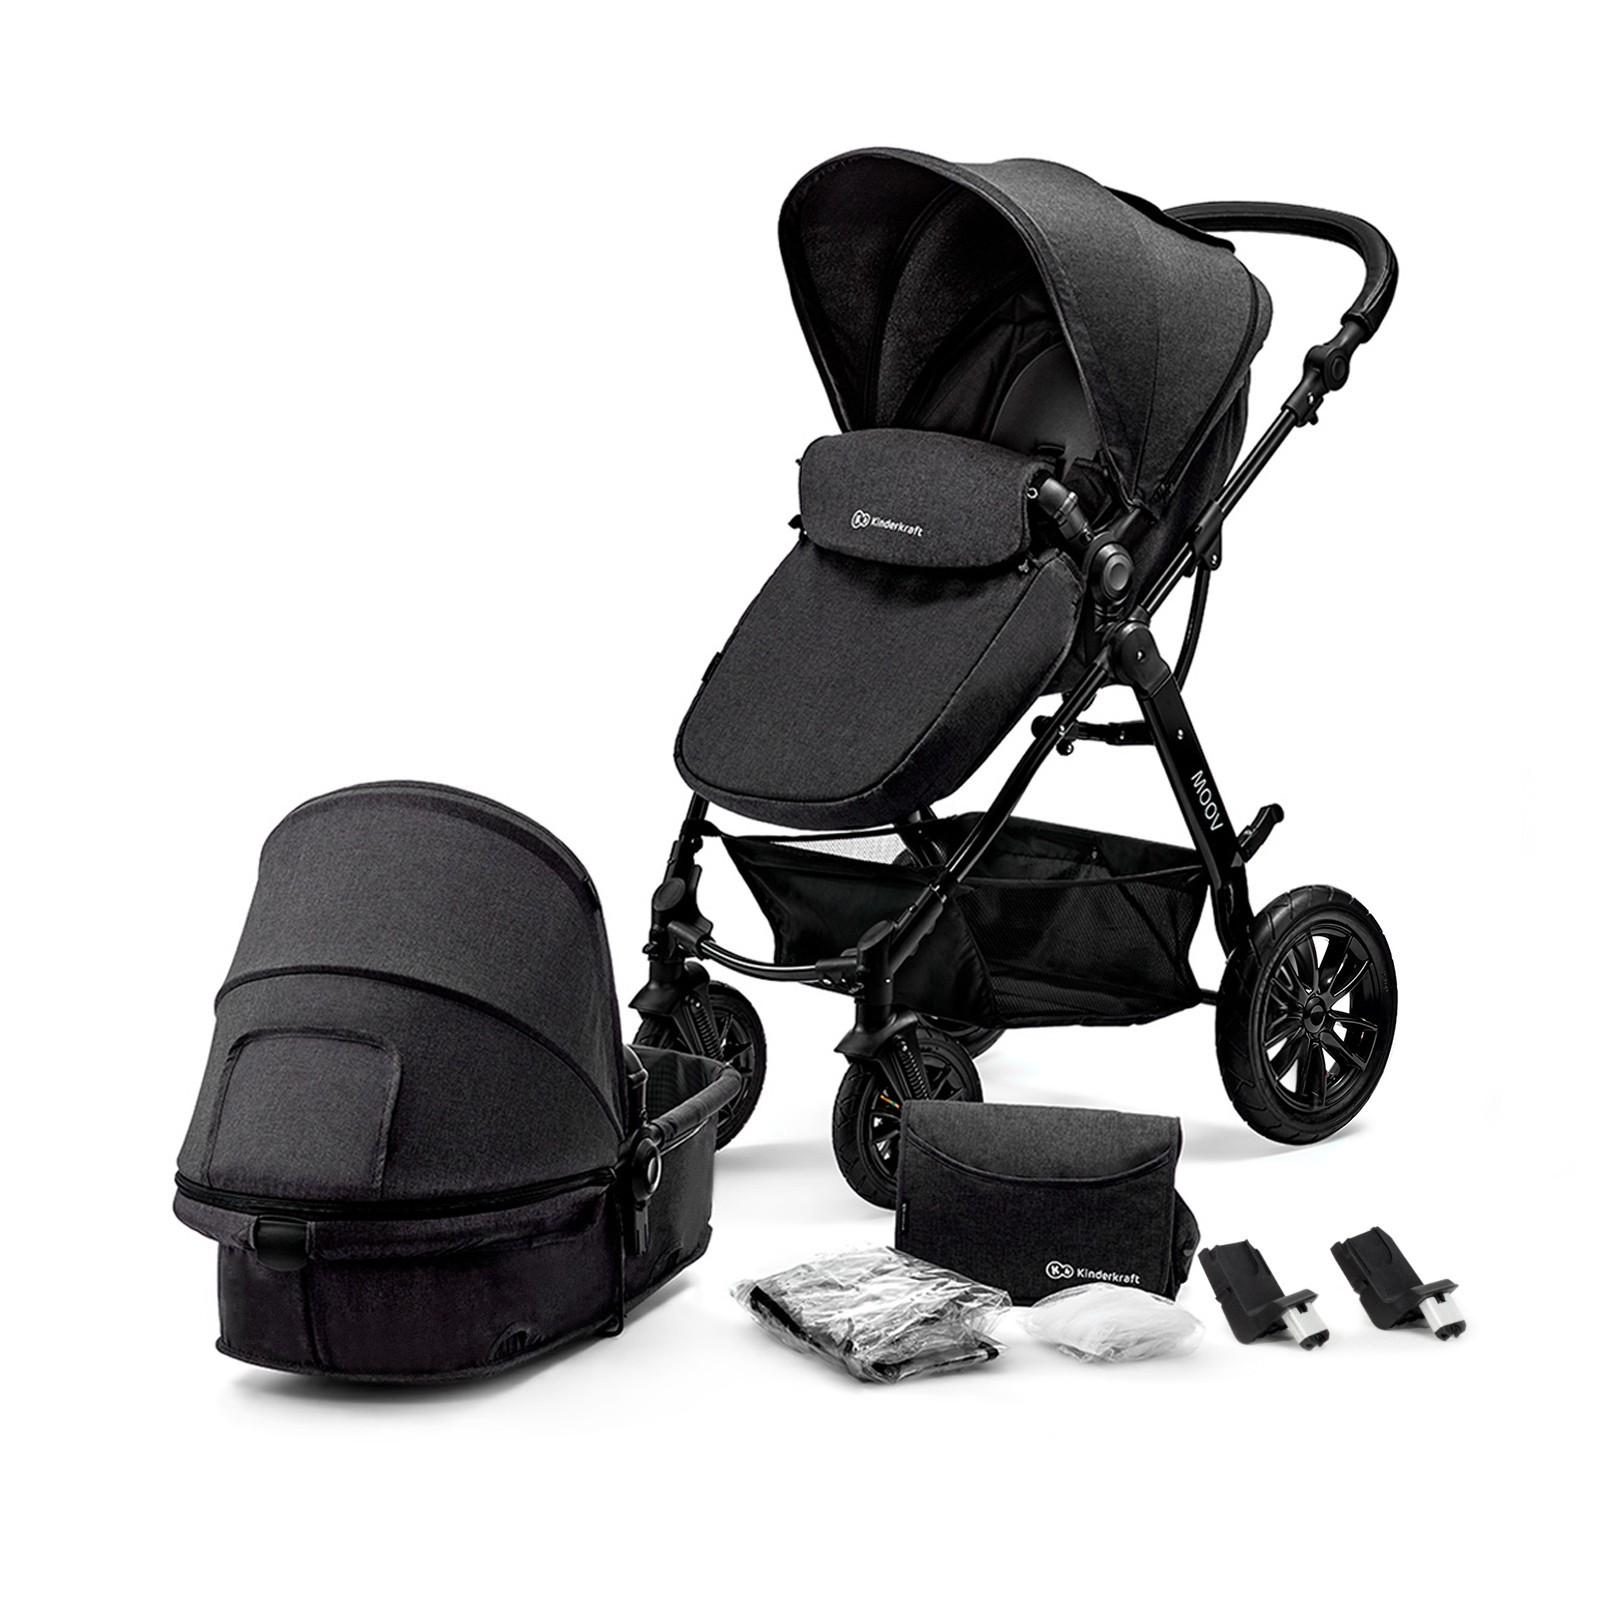 Kinderkraft Kinderwagen Moov 2 in 1 Black